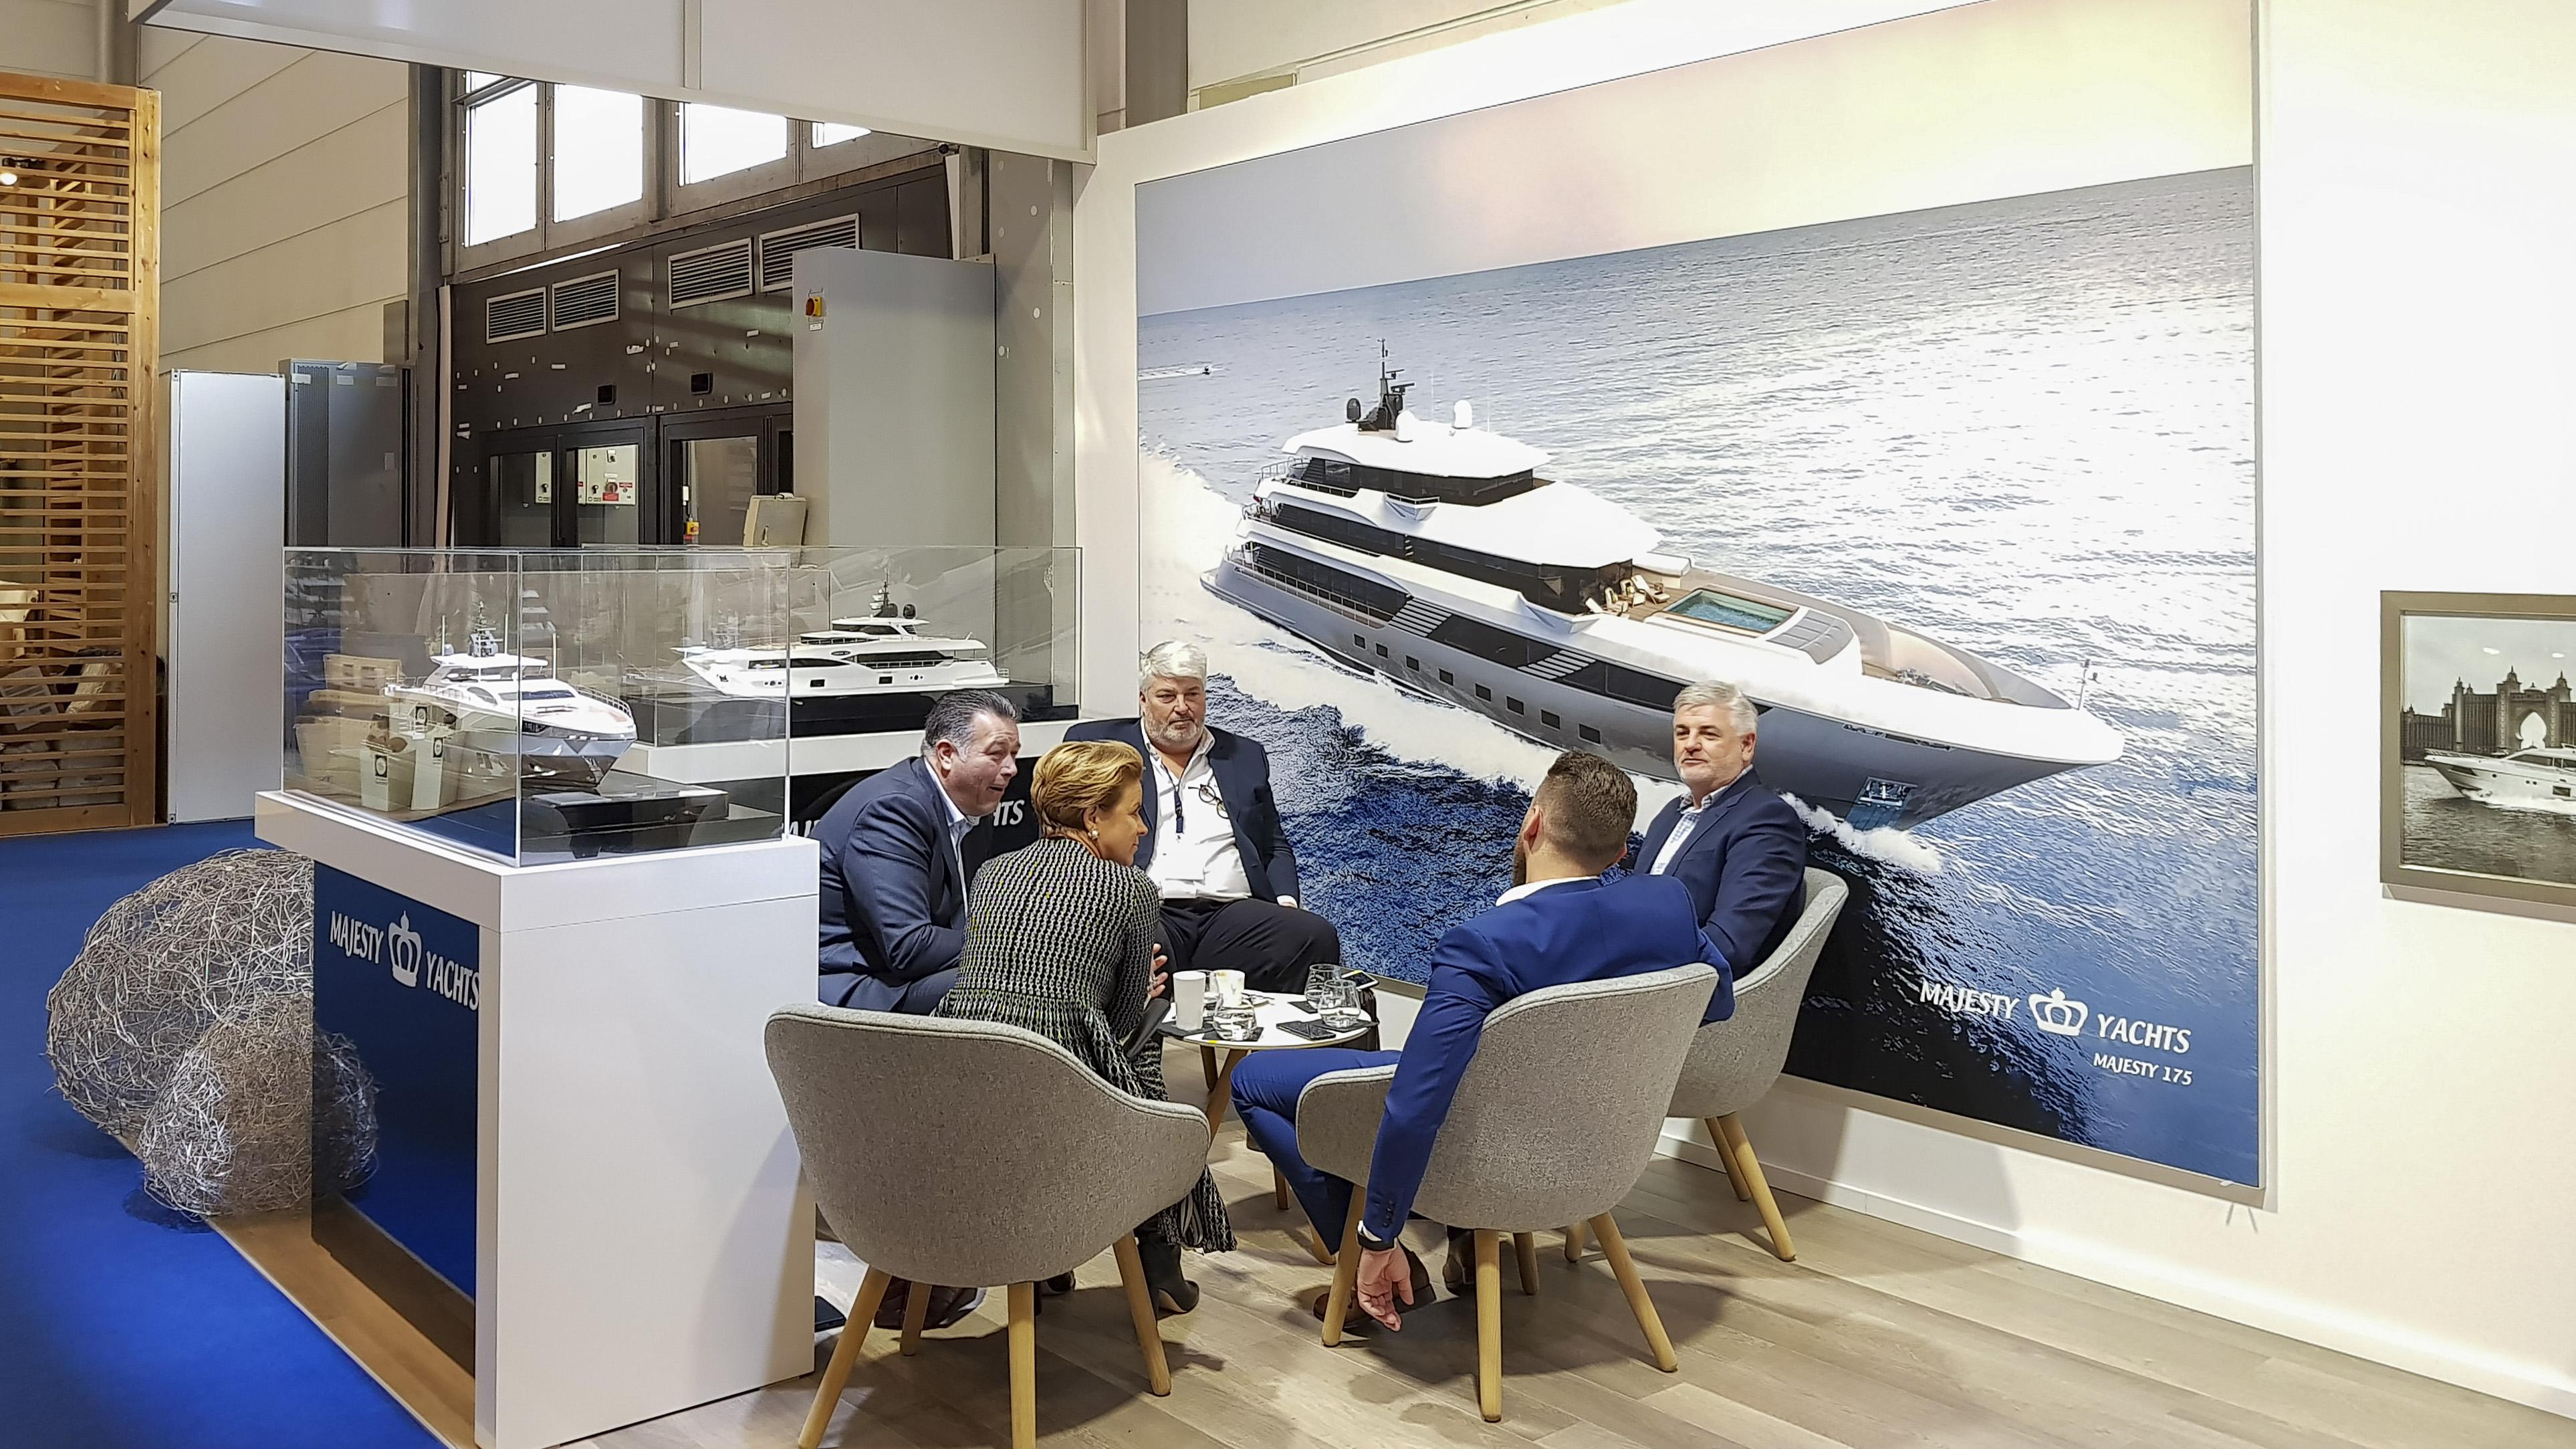 Gulf Craft at Dusseldorf Boat Show 2019 Day 2 (3)